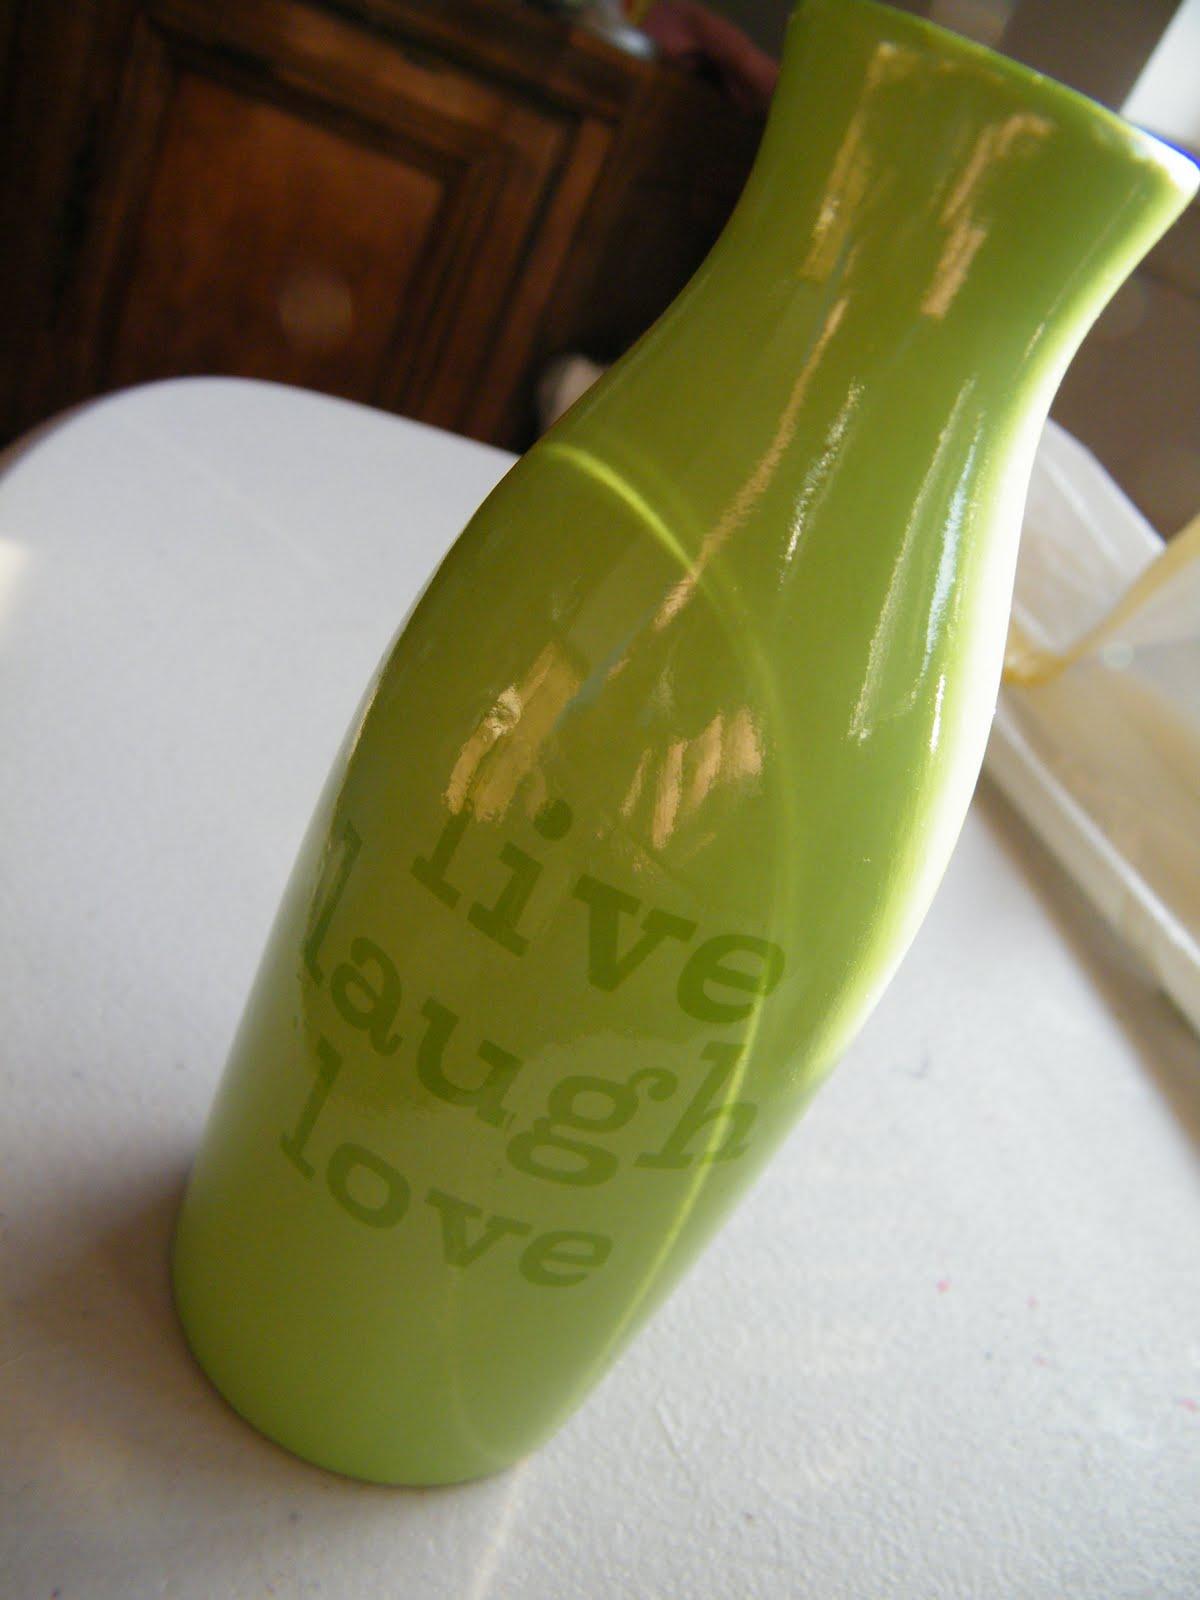 Flower vase pronunciation - A Vase Or A Vaaaz Depending On Your Pronunciation